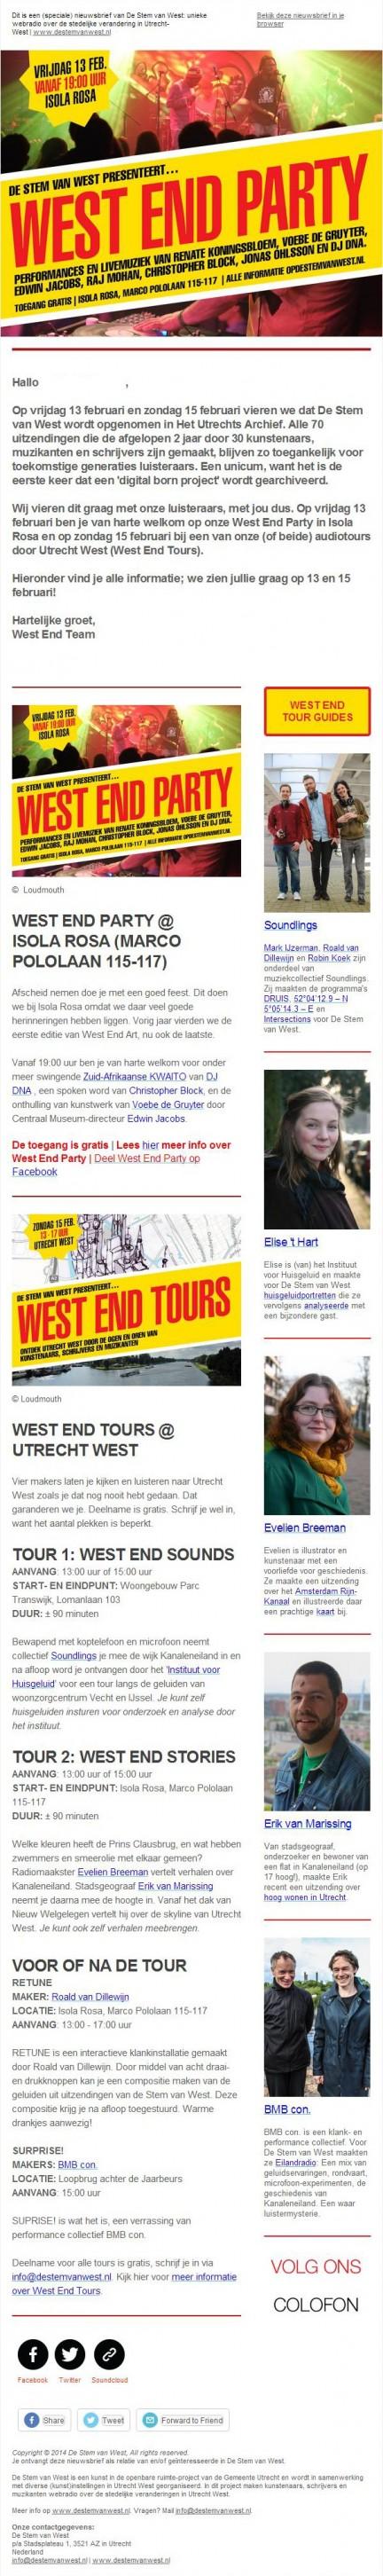 nieuwsbrief 21 - uitnodiging west end tours & party 13 en 15 feb 2015